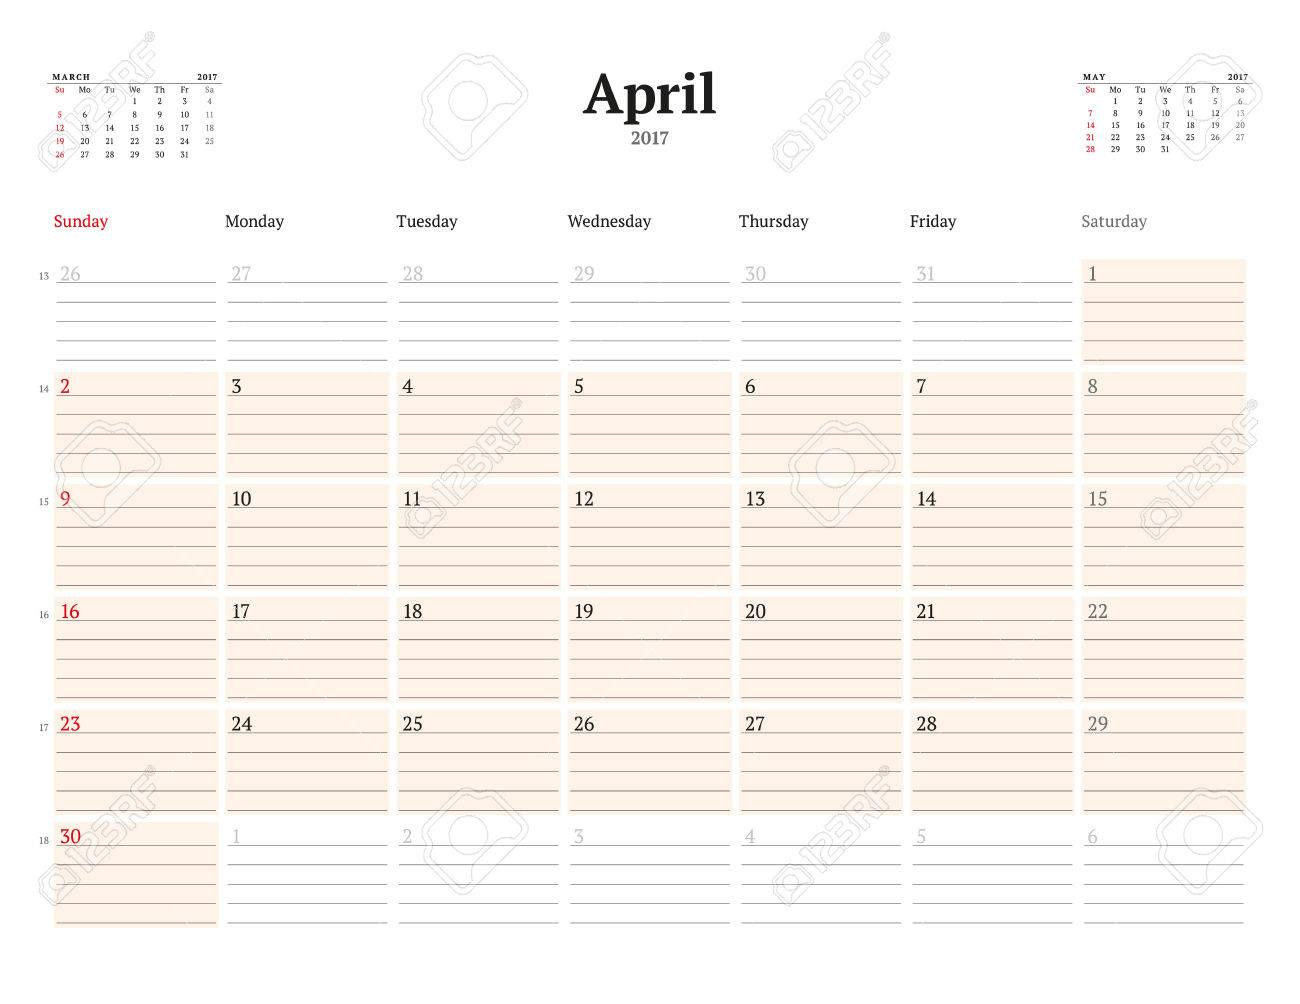 Kalendervorlage Für 2017 Jahr. April. Business Planner Vorlage ...